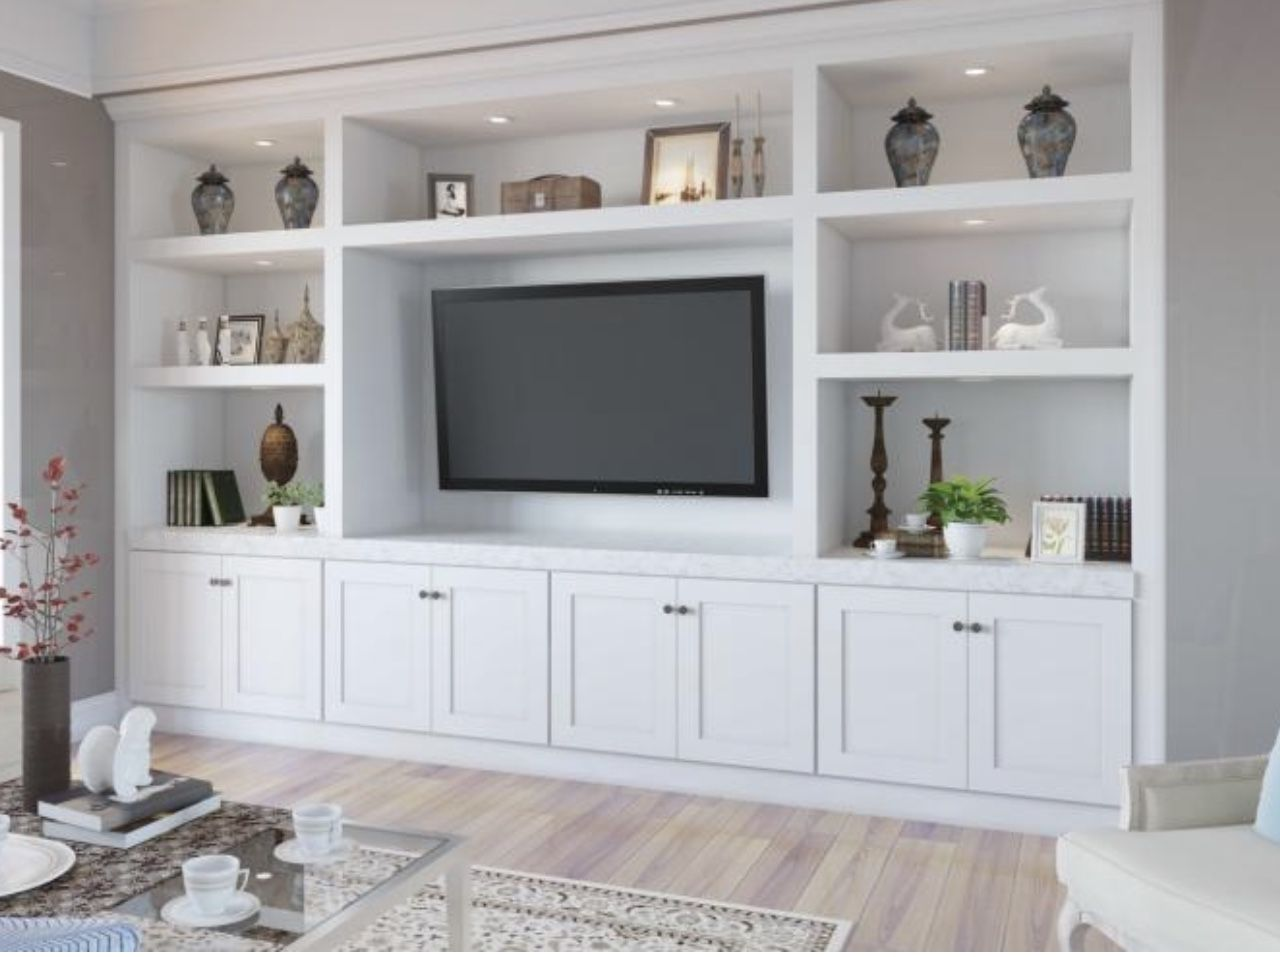 Built Ins In 2020 Tv Room Design Built In Shelves Living Room Living Room Wall Units #white #living #room #wall #units